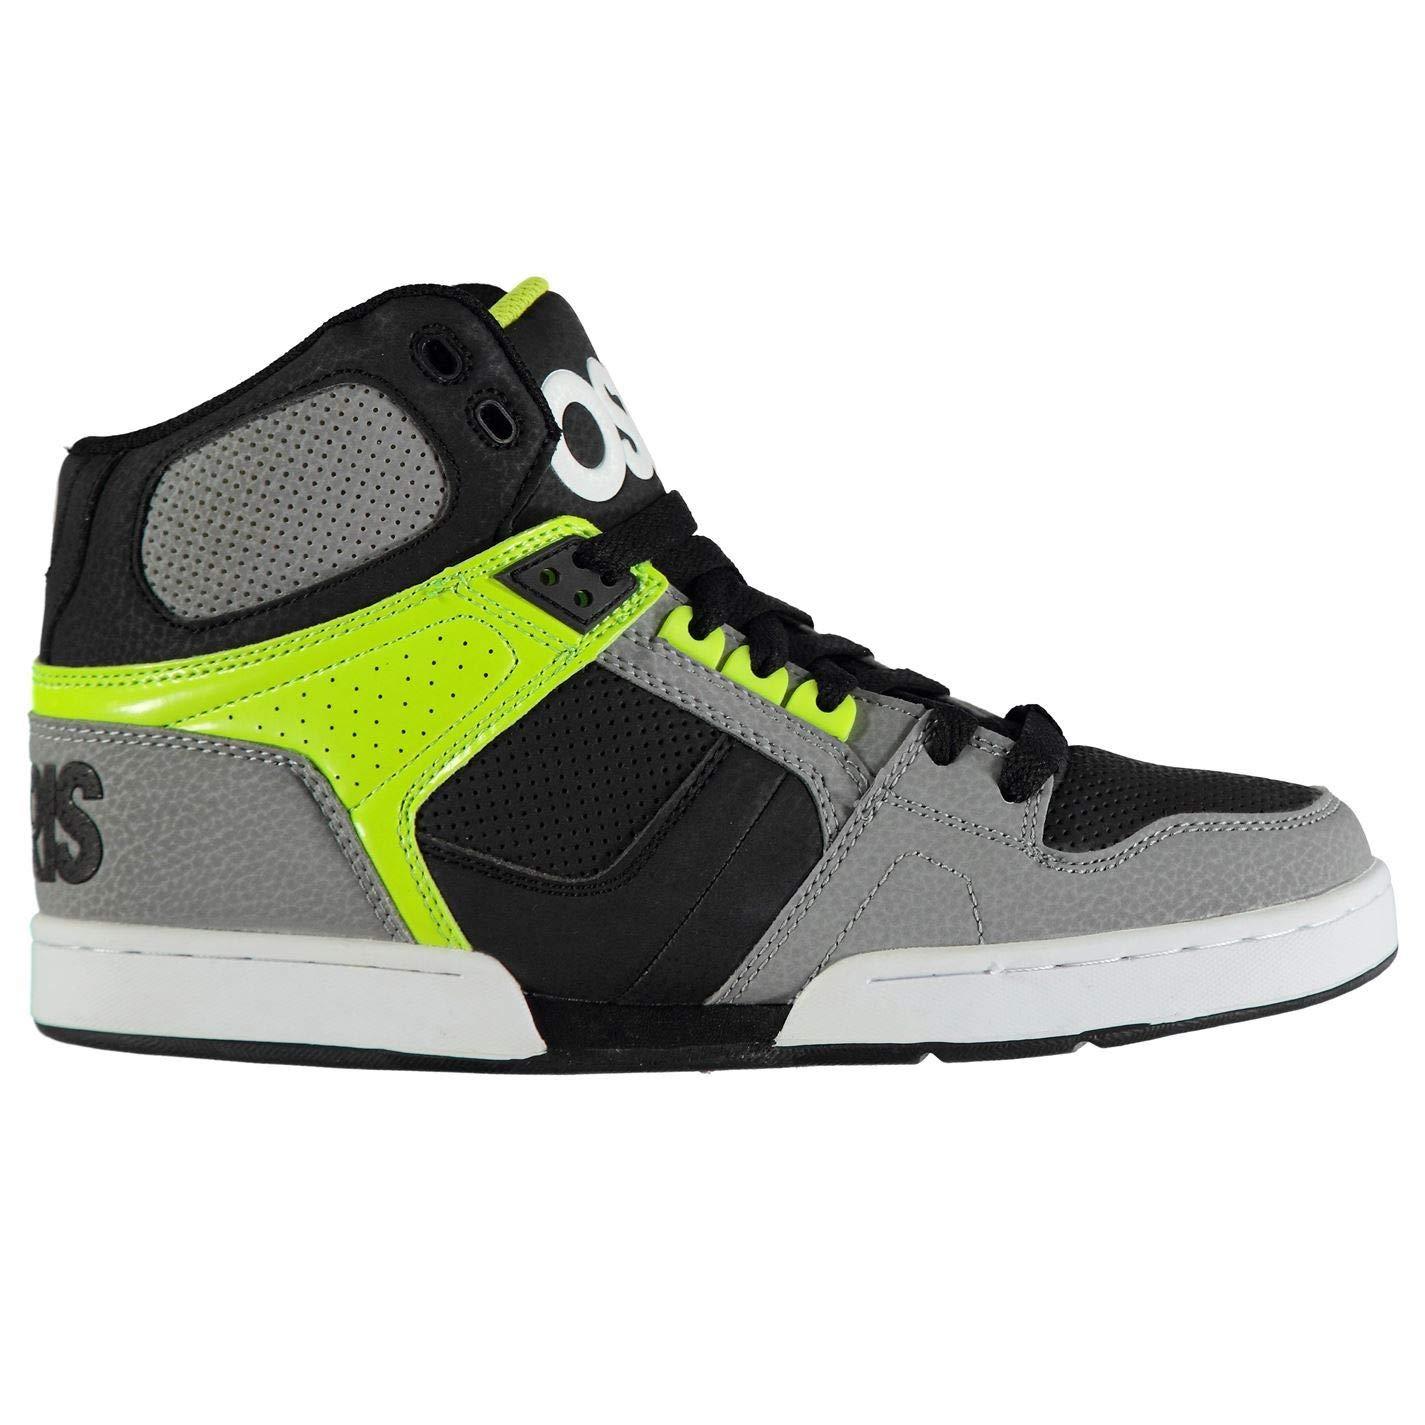 Official Brand Osiris NYC 83 Herren Skateboardschuhe Skateboardschuhe Skateboardschuhe Grau Limettengrün 076b76